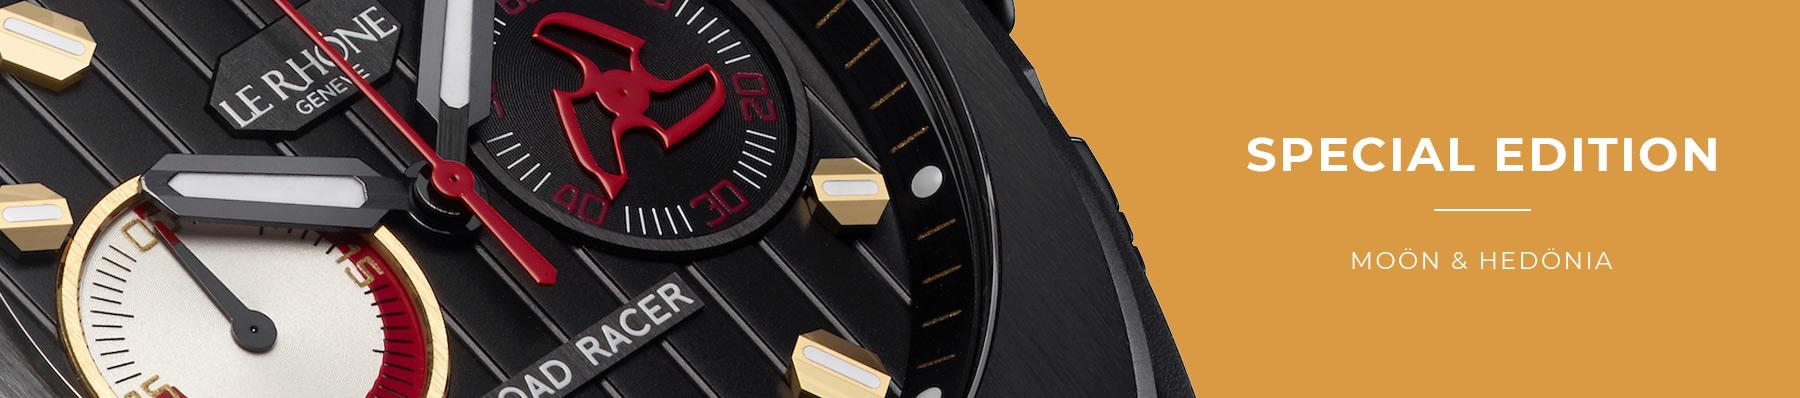 le-rhone-watch-limited-edition-ban-4